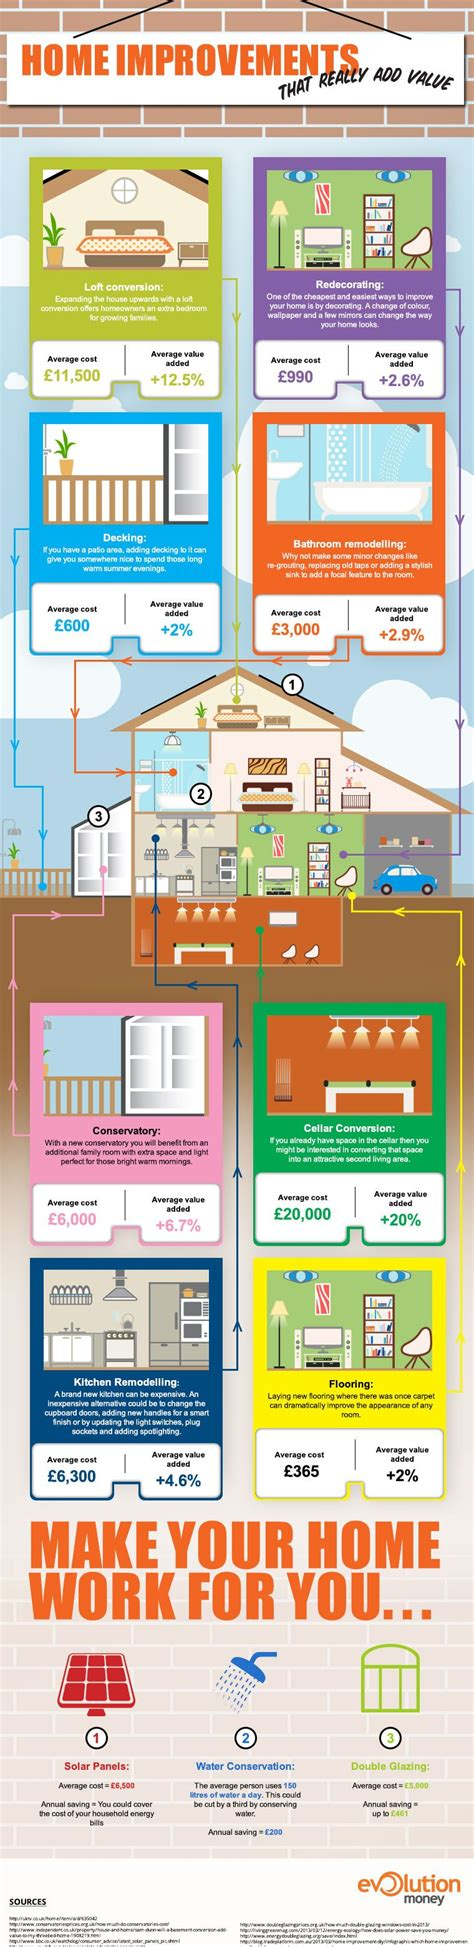 valuable home improvements infographic evolution money